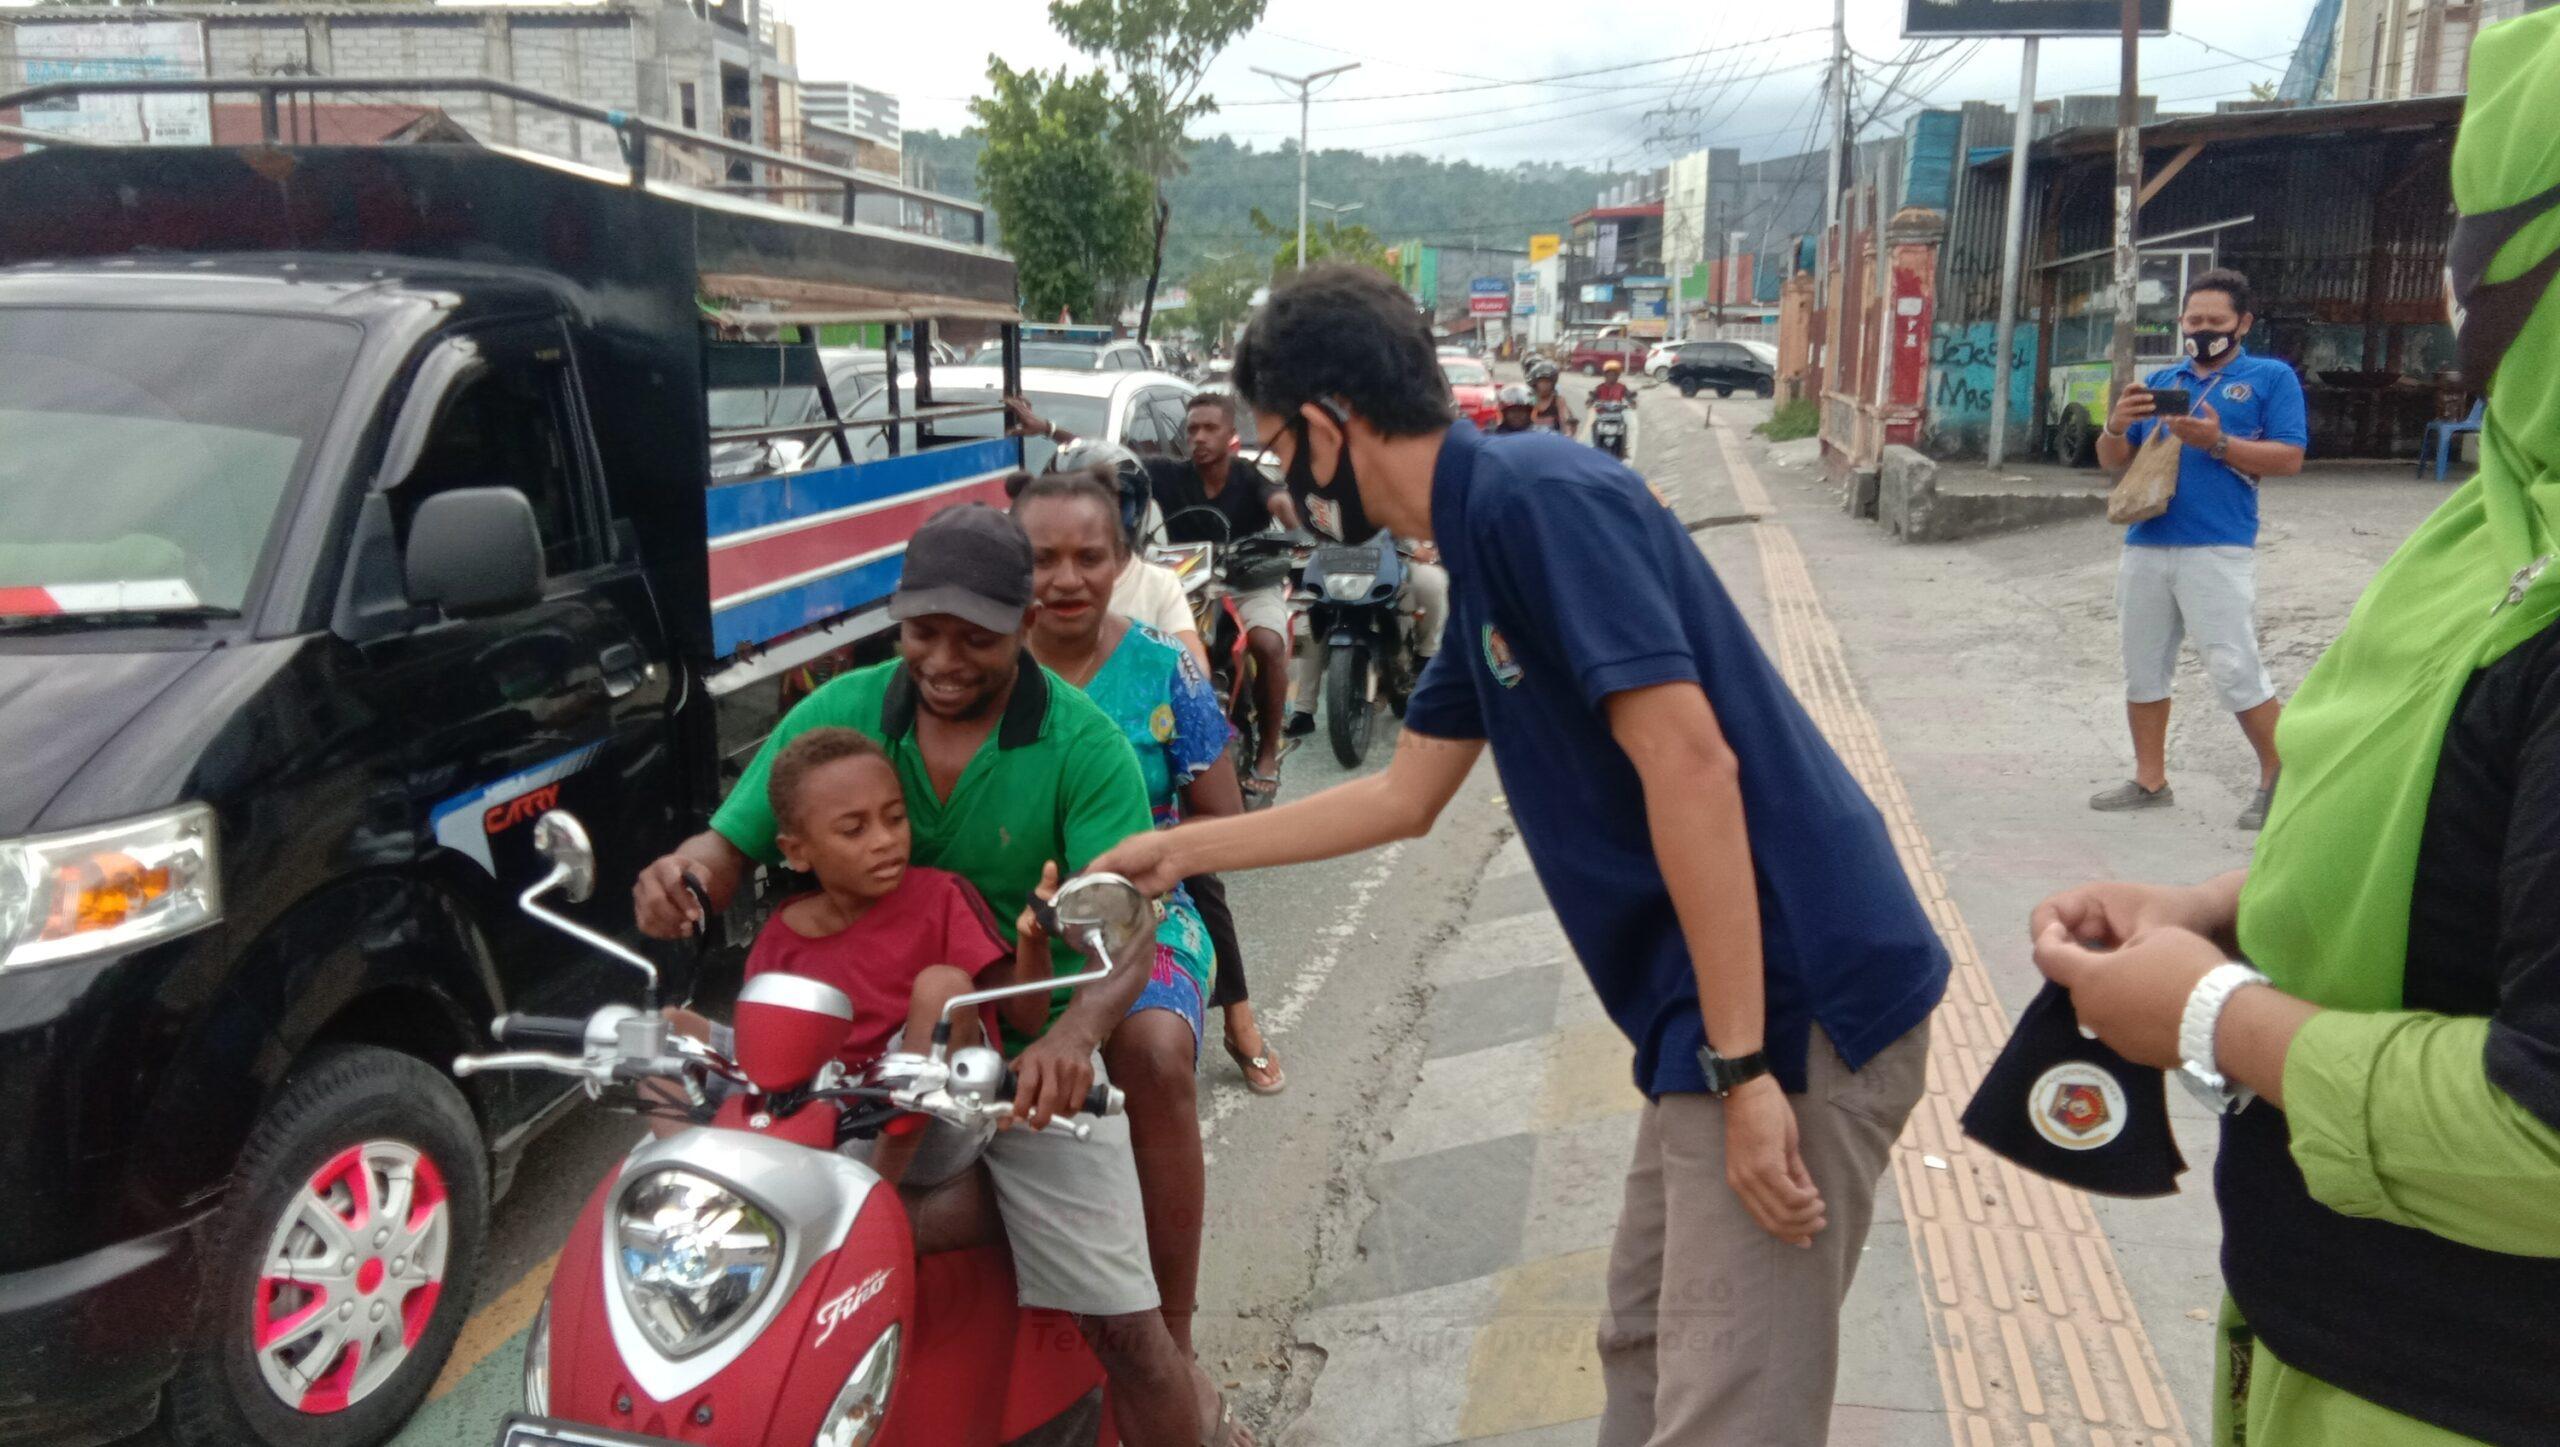 PWI Papua Barat Bagi 1000 Masker di Manokwari 4 IMG 20210207 WA0108 1 scaled